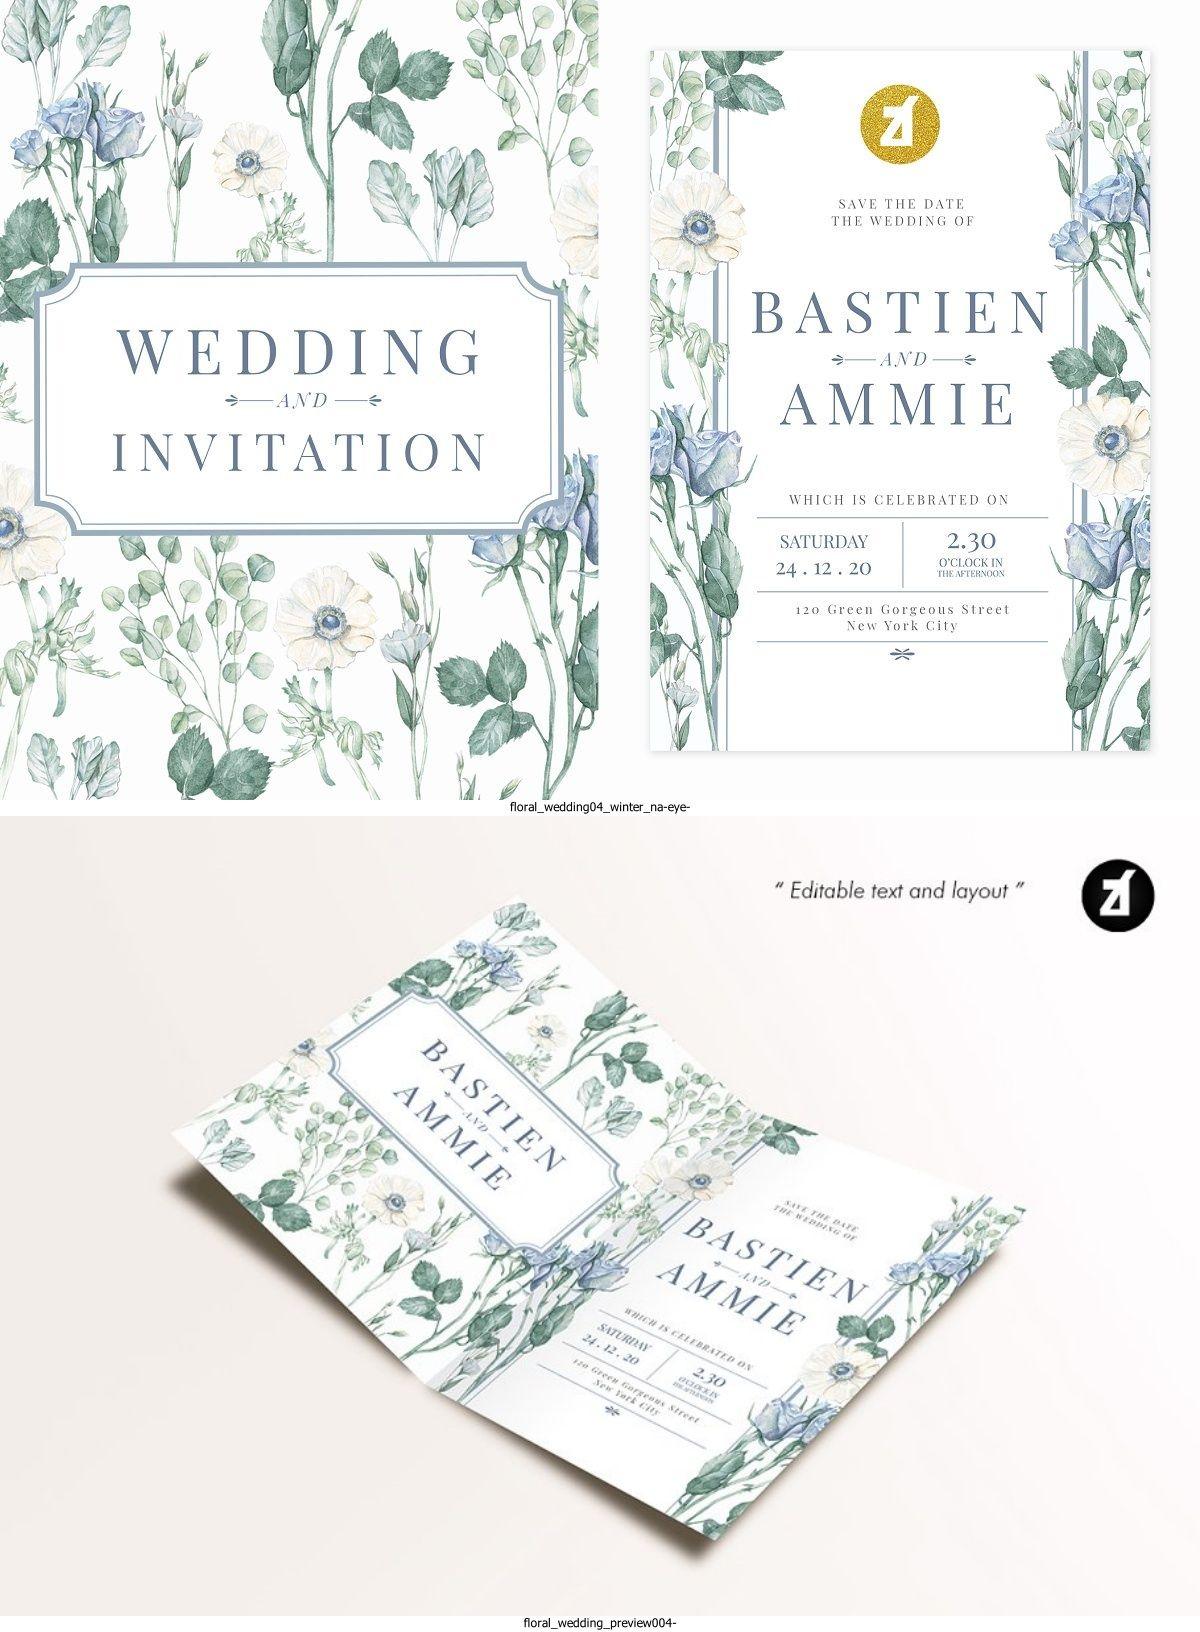 Floral Handdrawn Watercolor Wedding Invitation Floral Handdrawn Watercolor Wedding Invitation